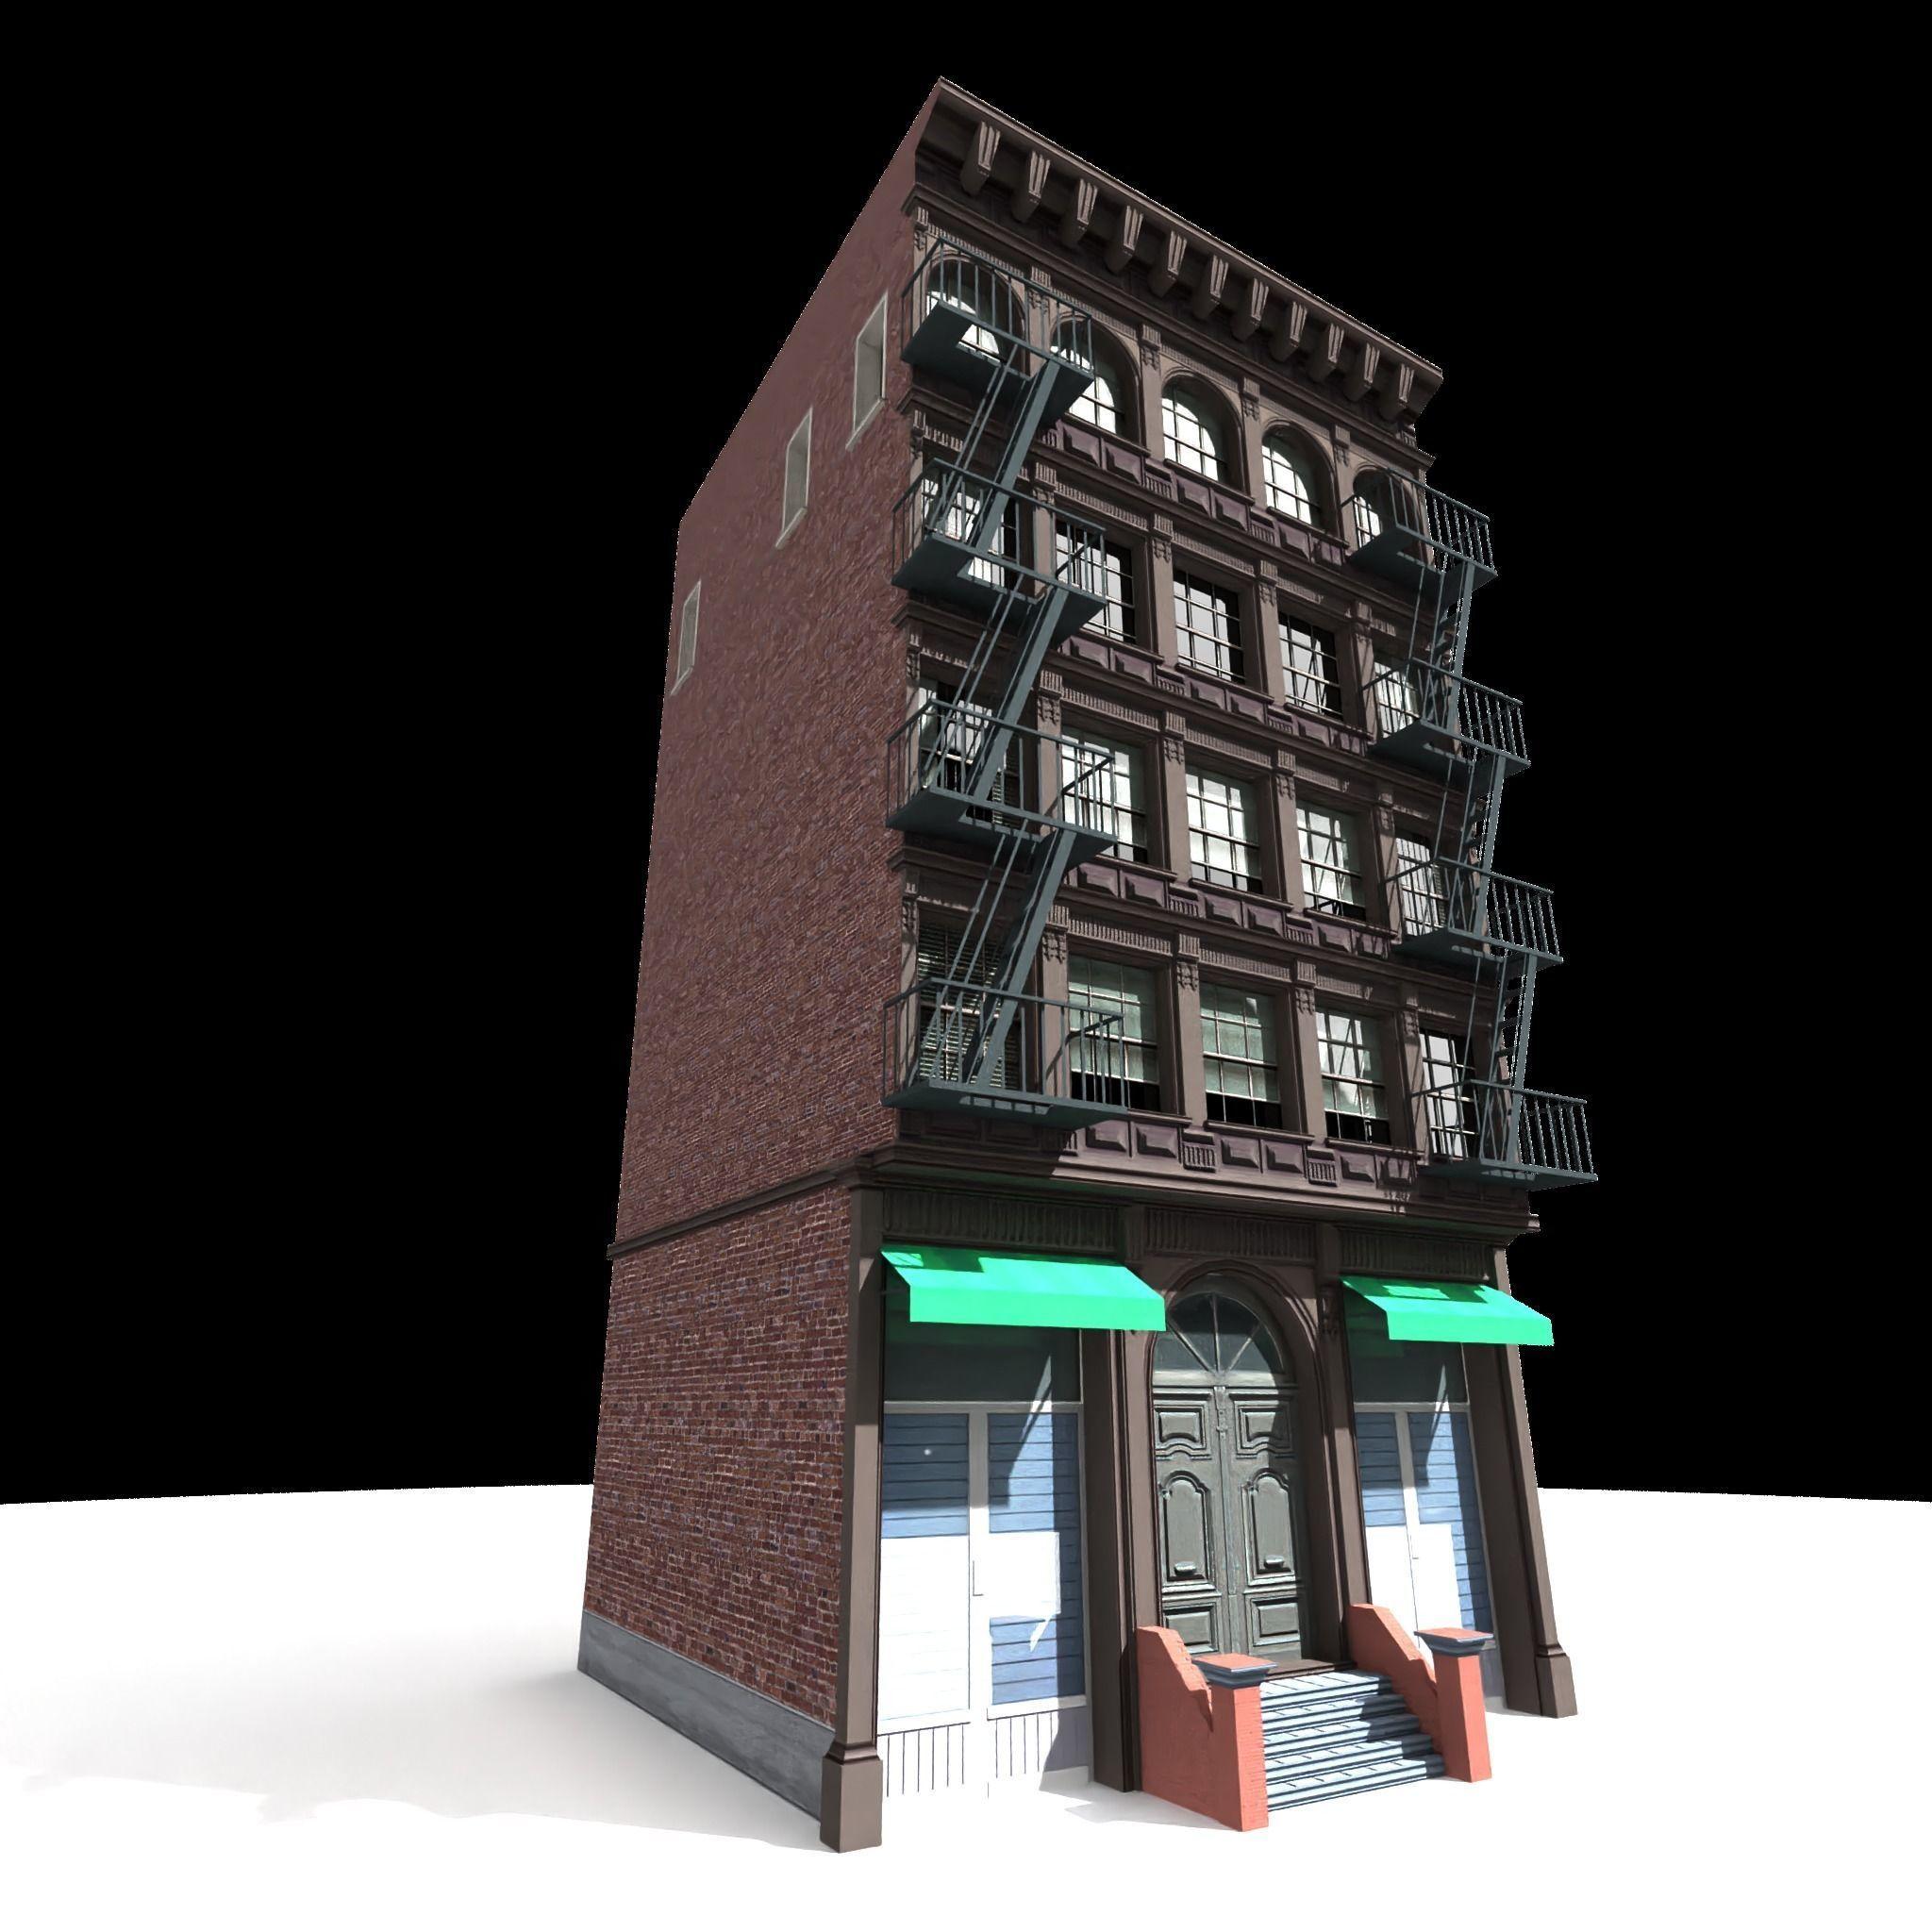 Nyc Building 12 type 1